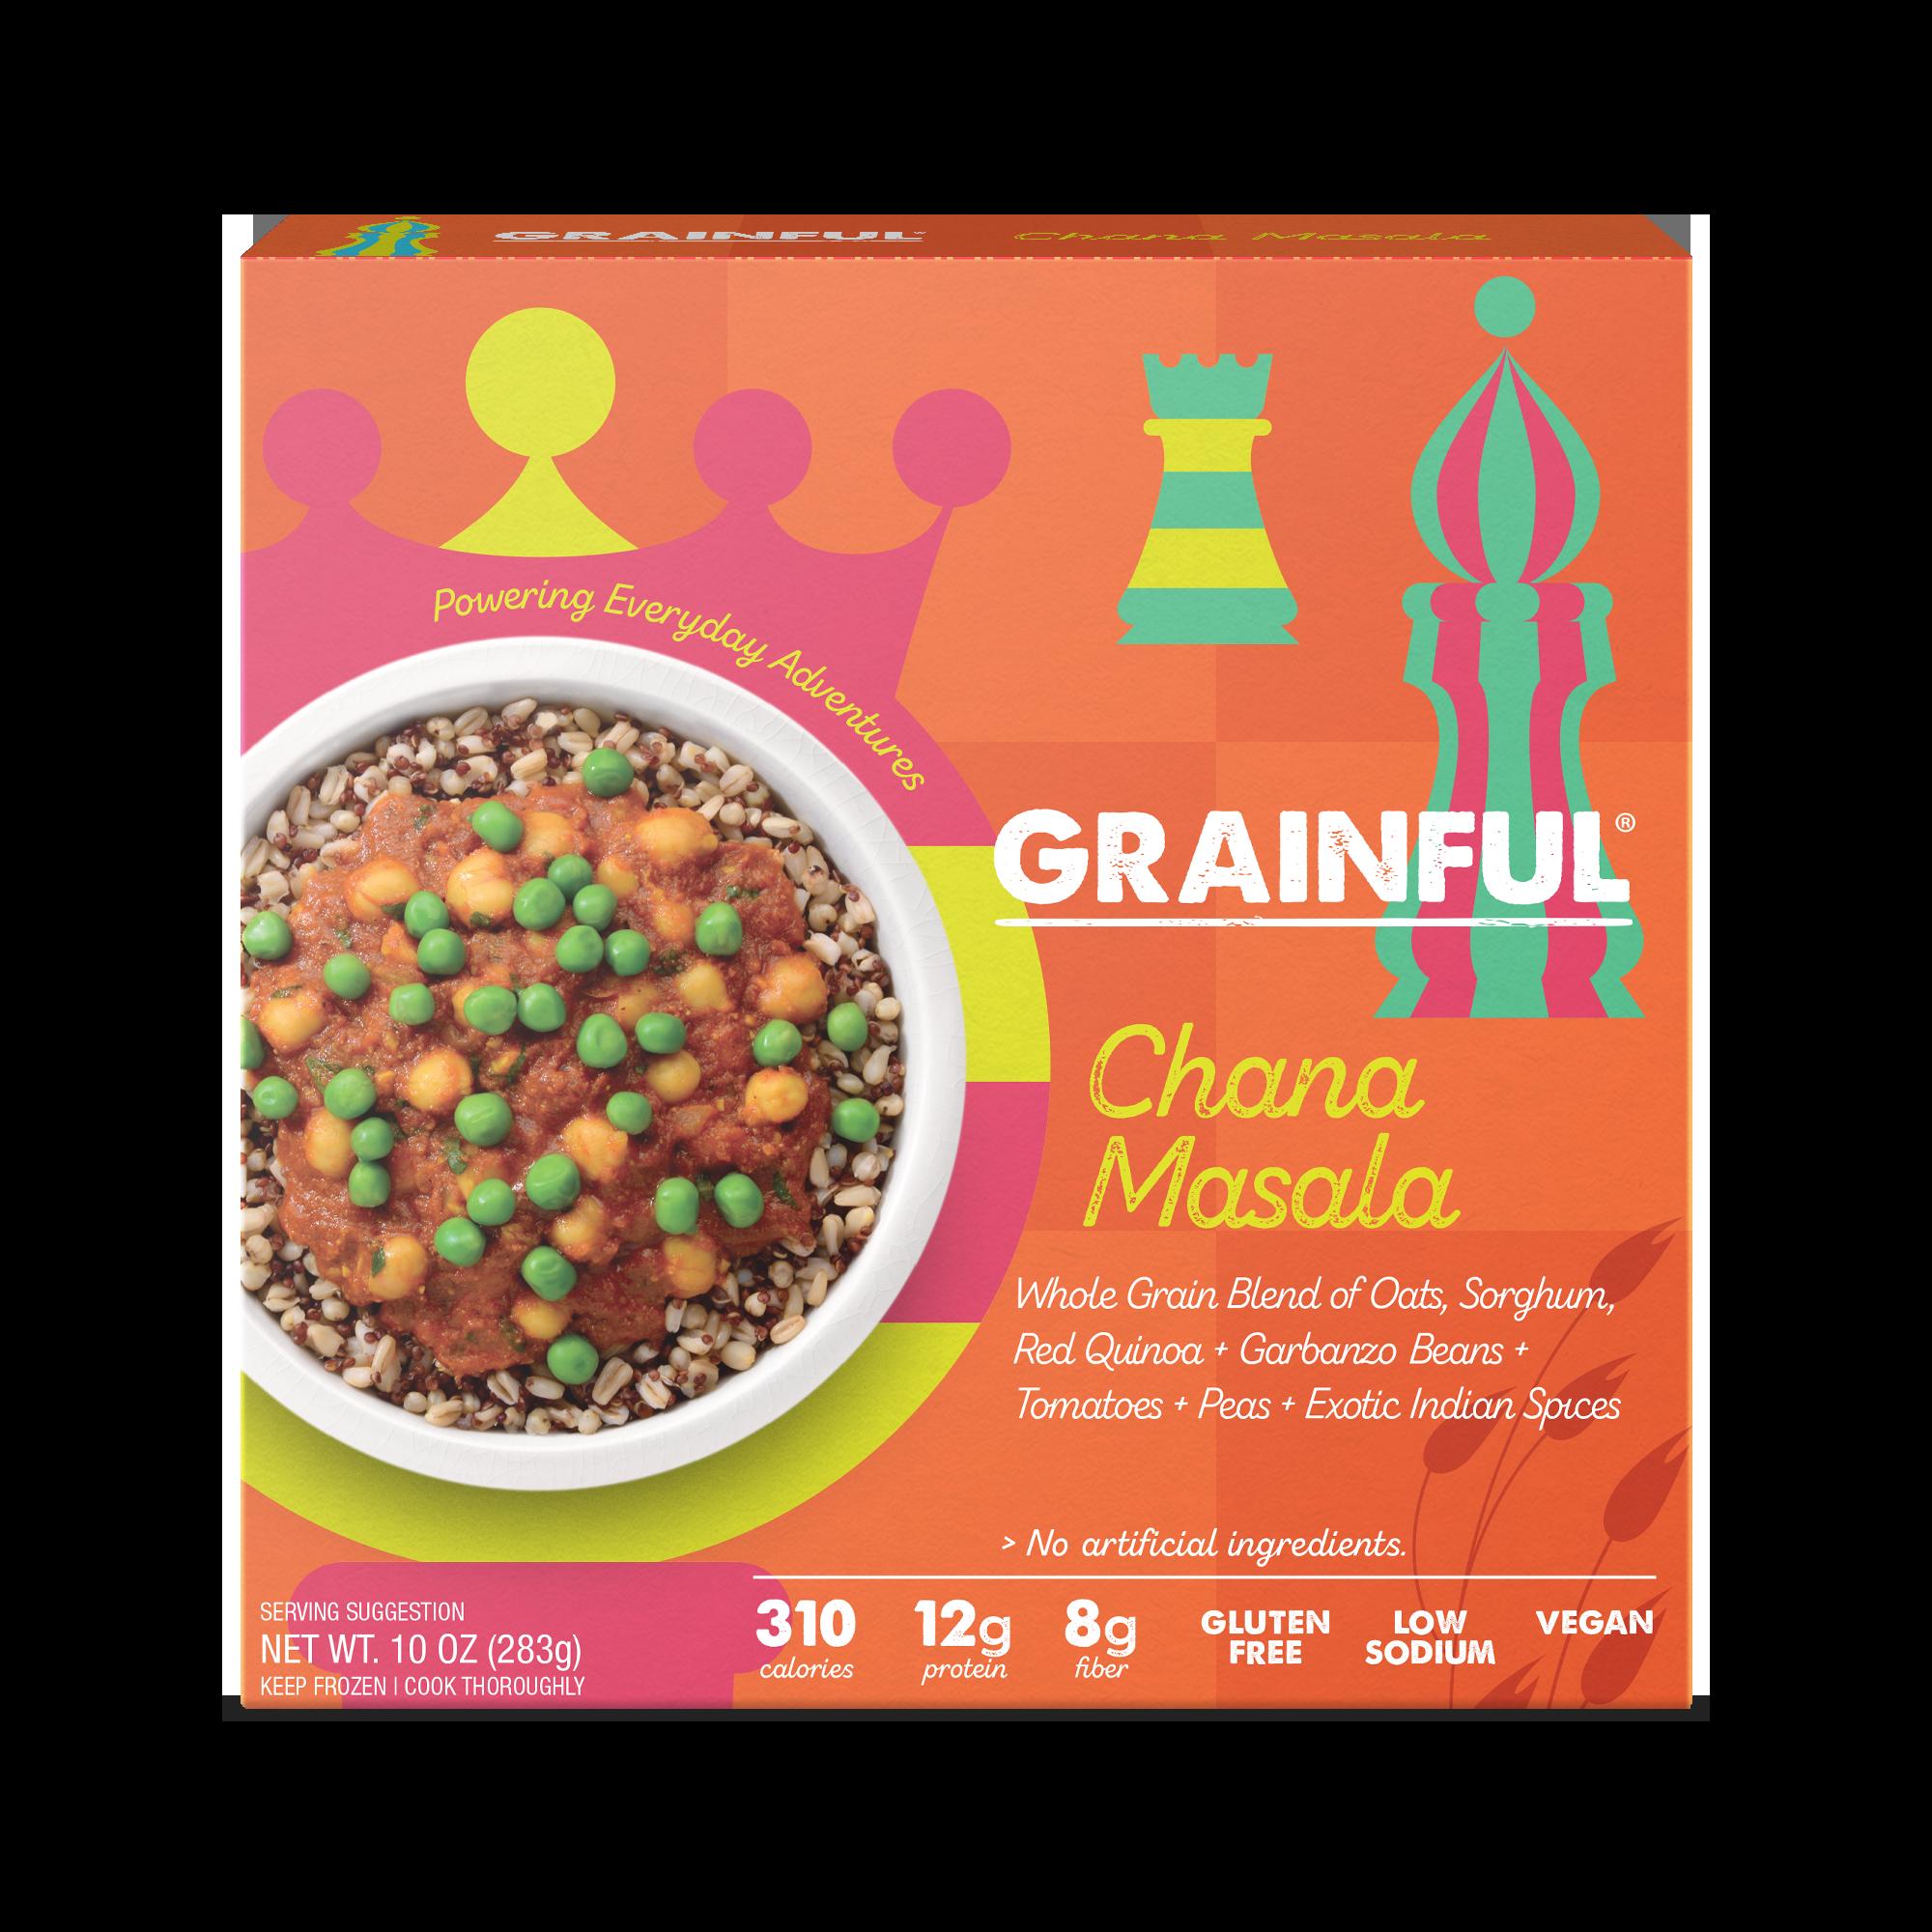 Grainful Target 3D Mockup_v1_Chana Masala.png